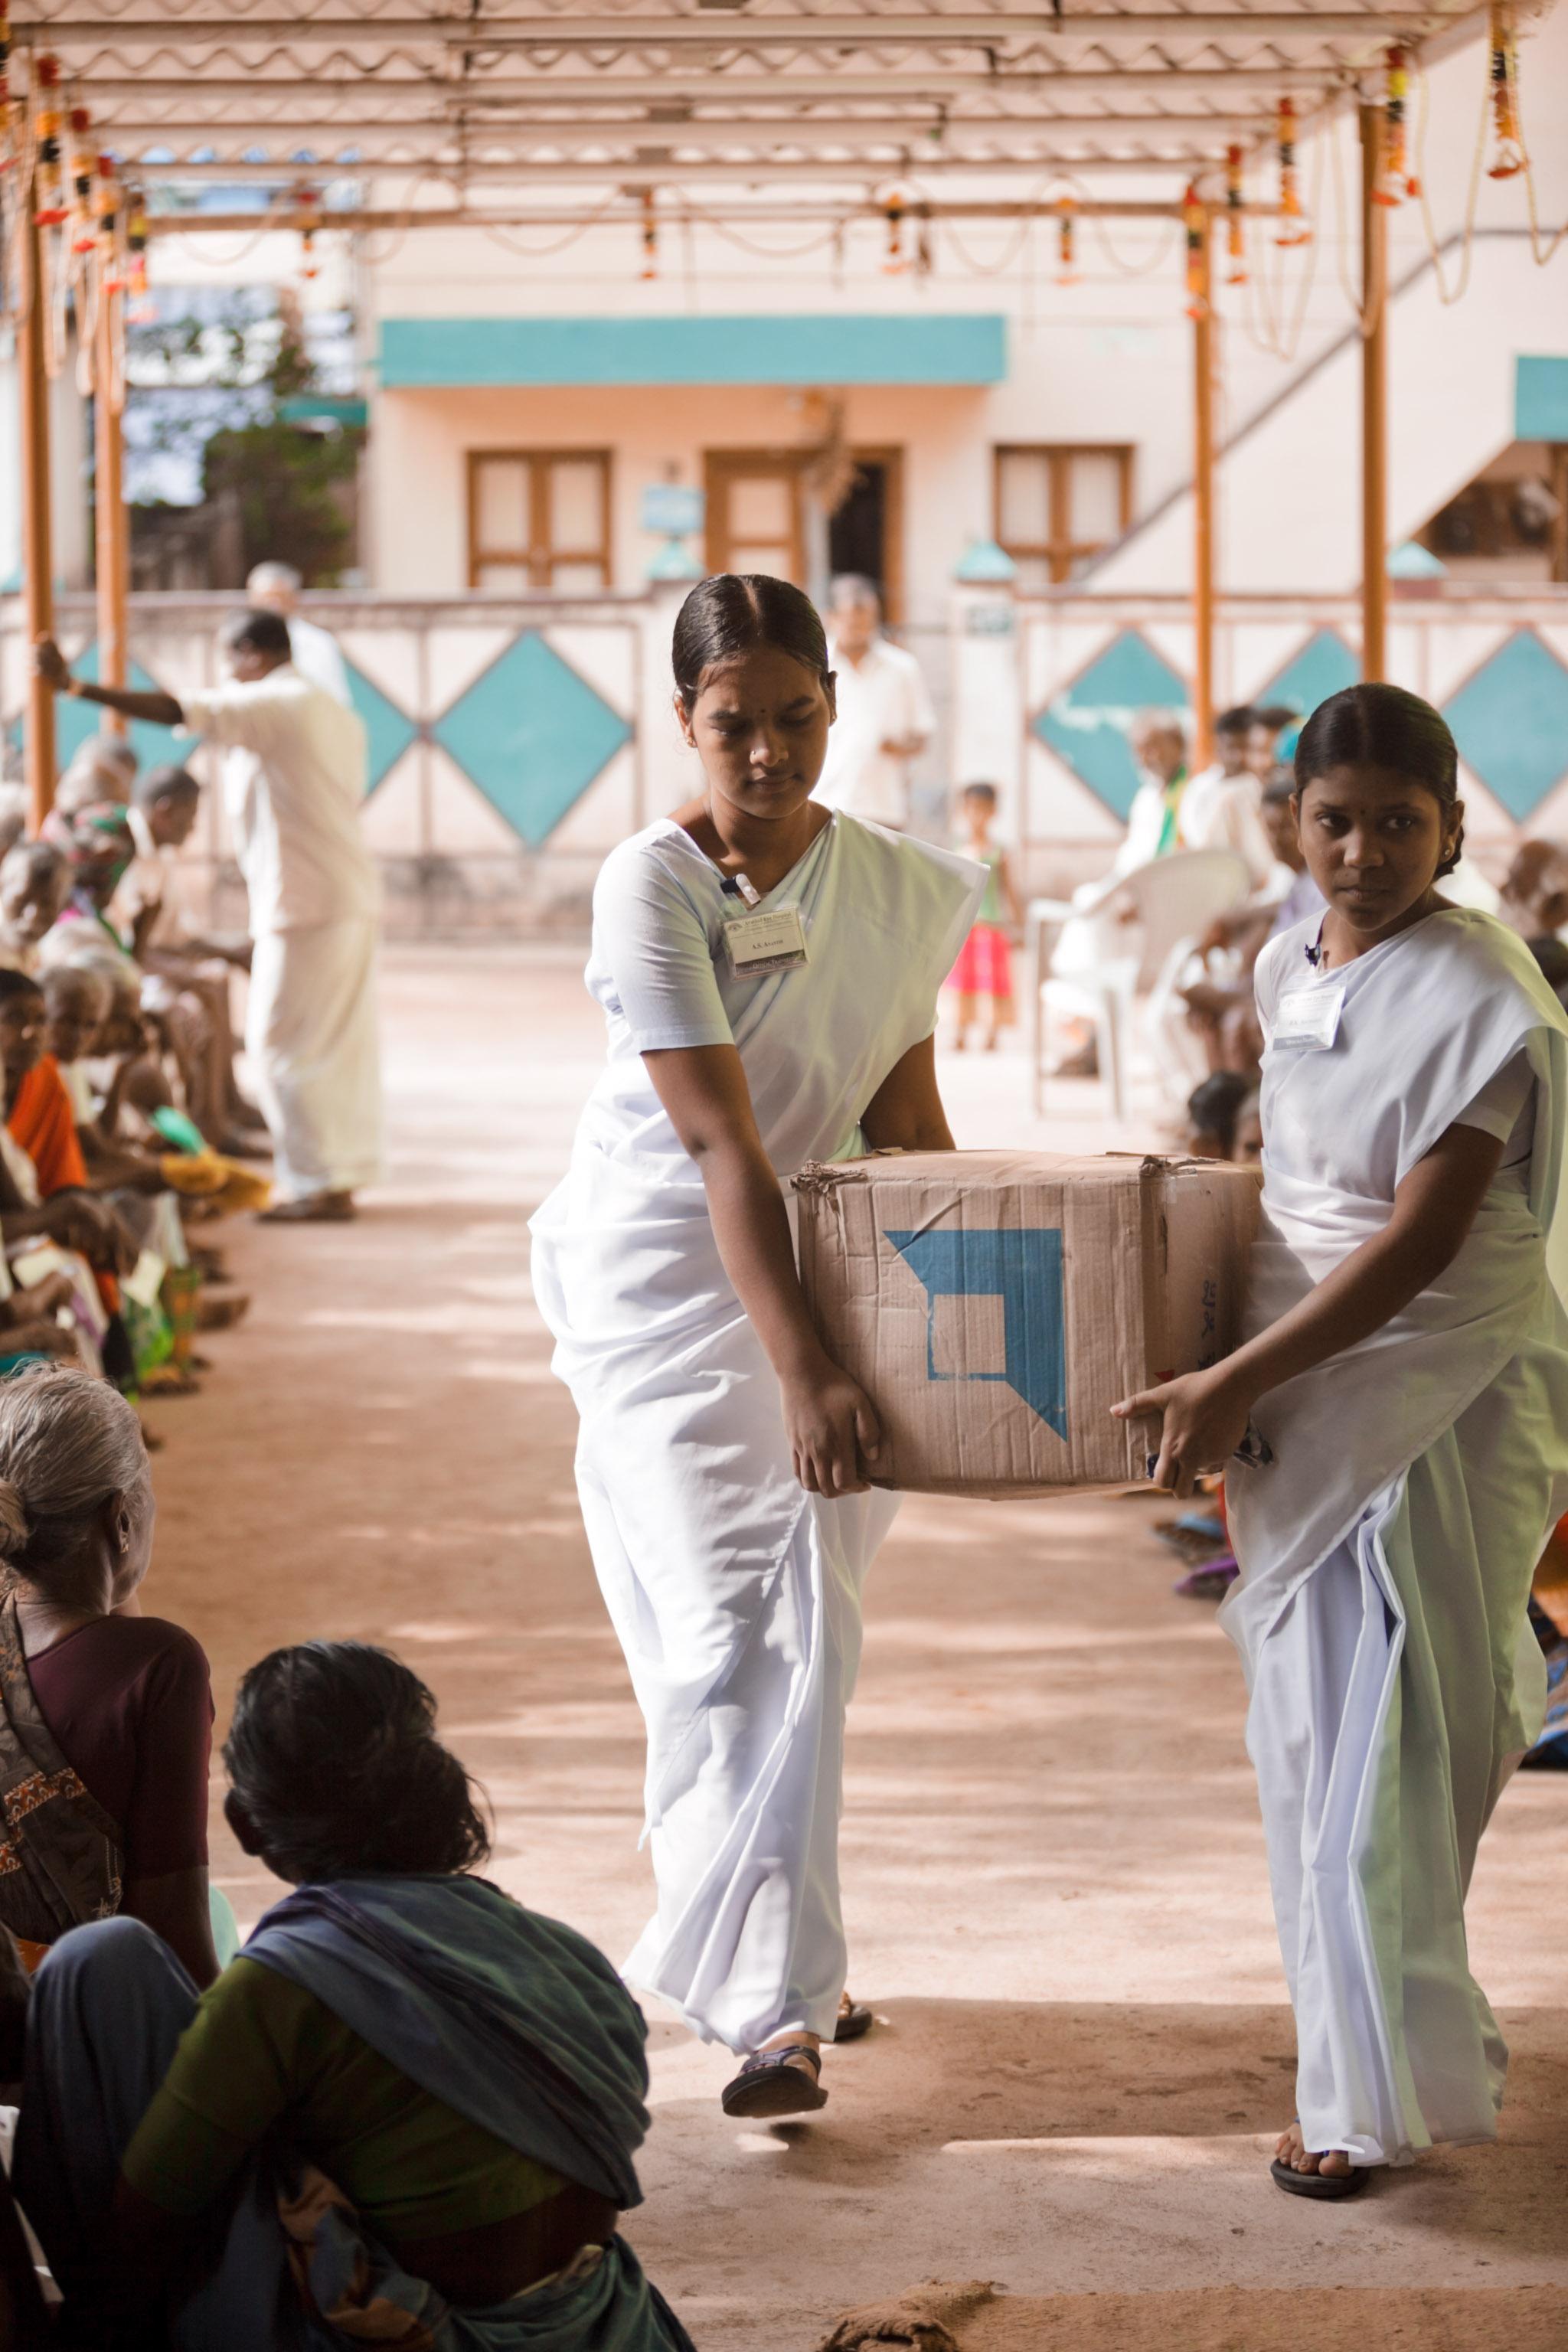 20110226_aravind-field-clinic_02.jpg